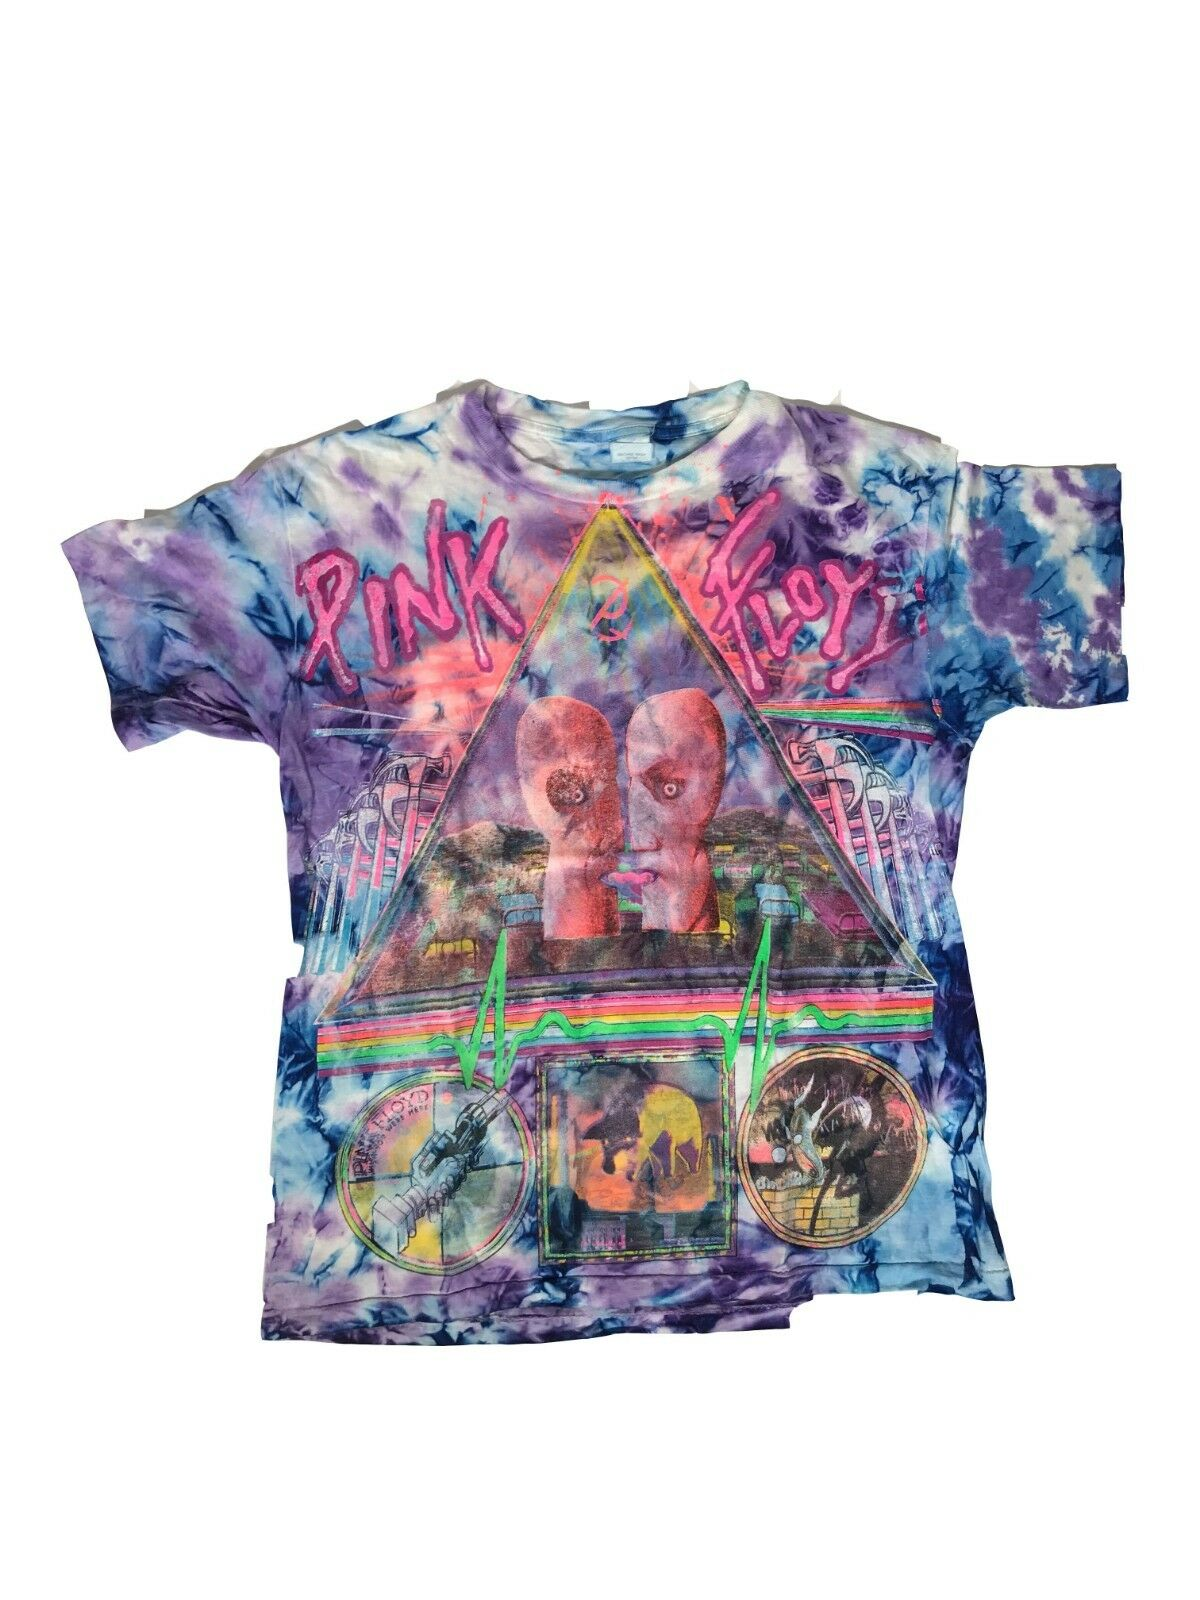 23383d93f Vintage VTG 90s Pink Floyd Bell Tie Tour T-Shirt Division Dye ...